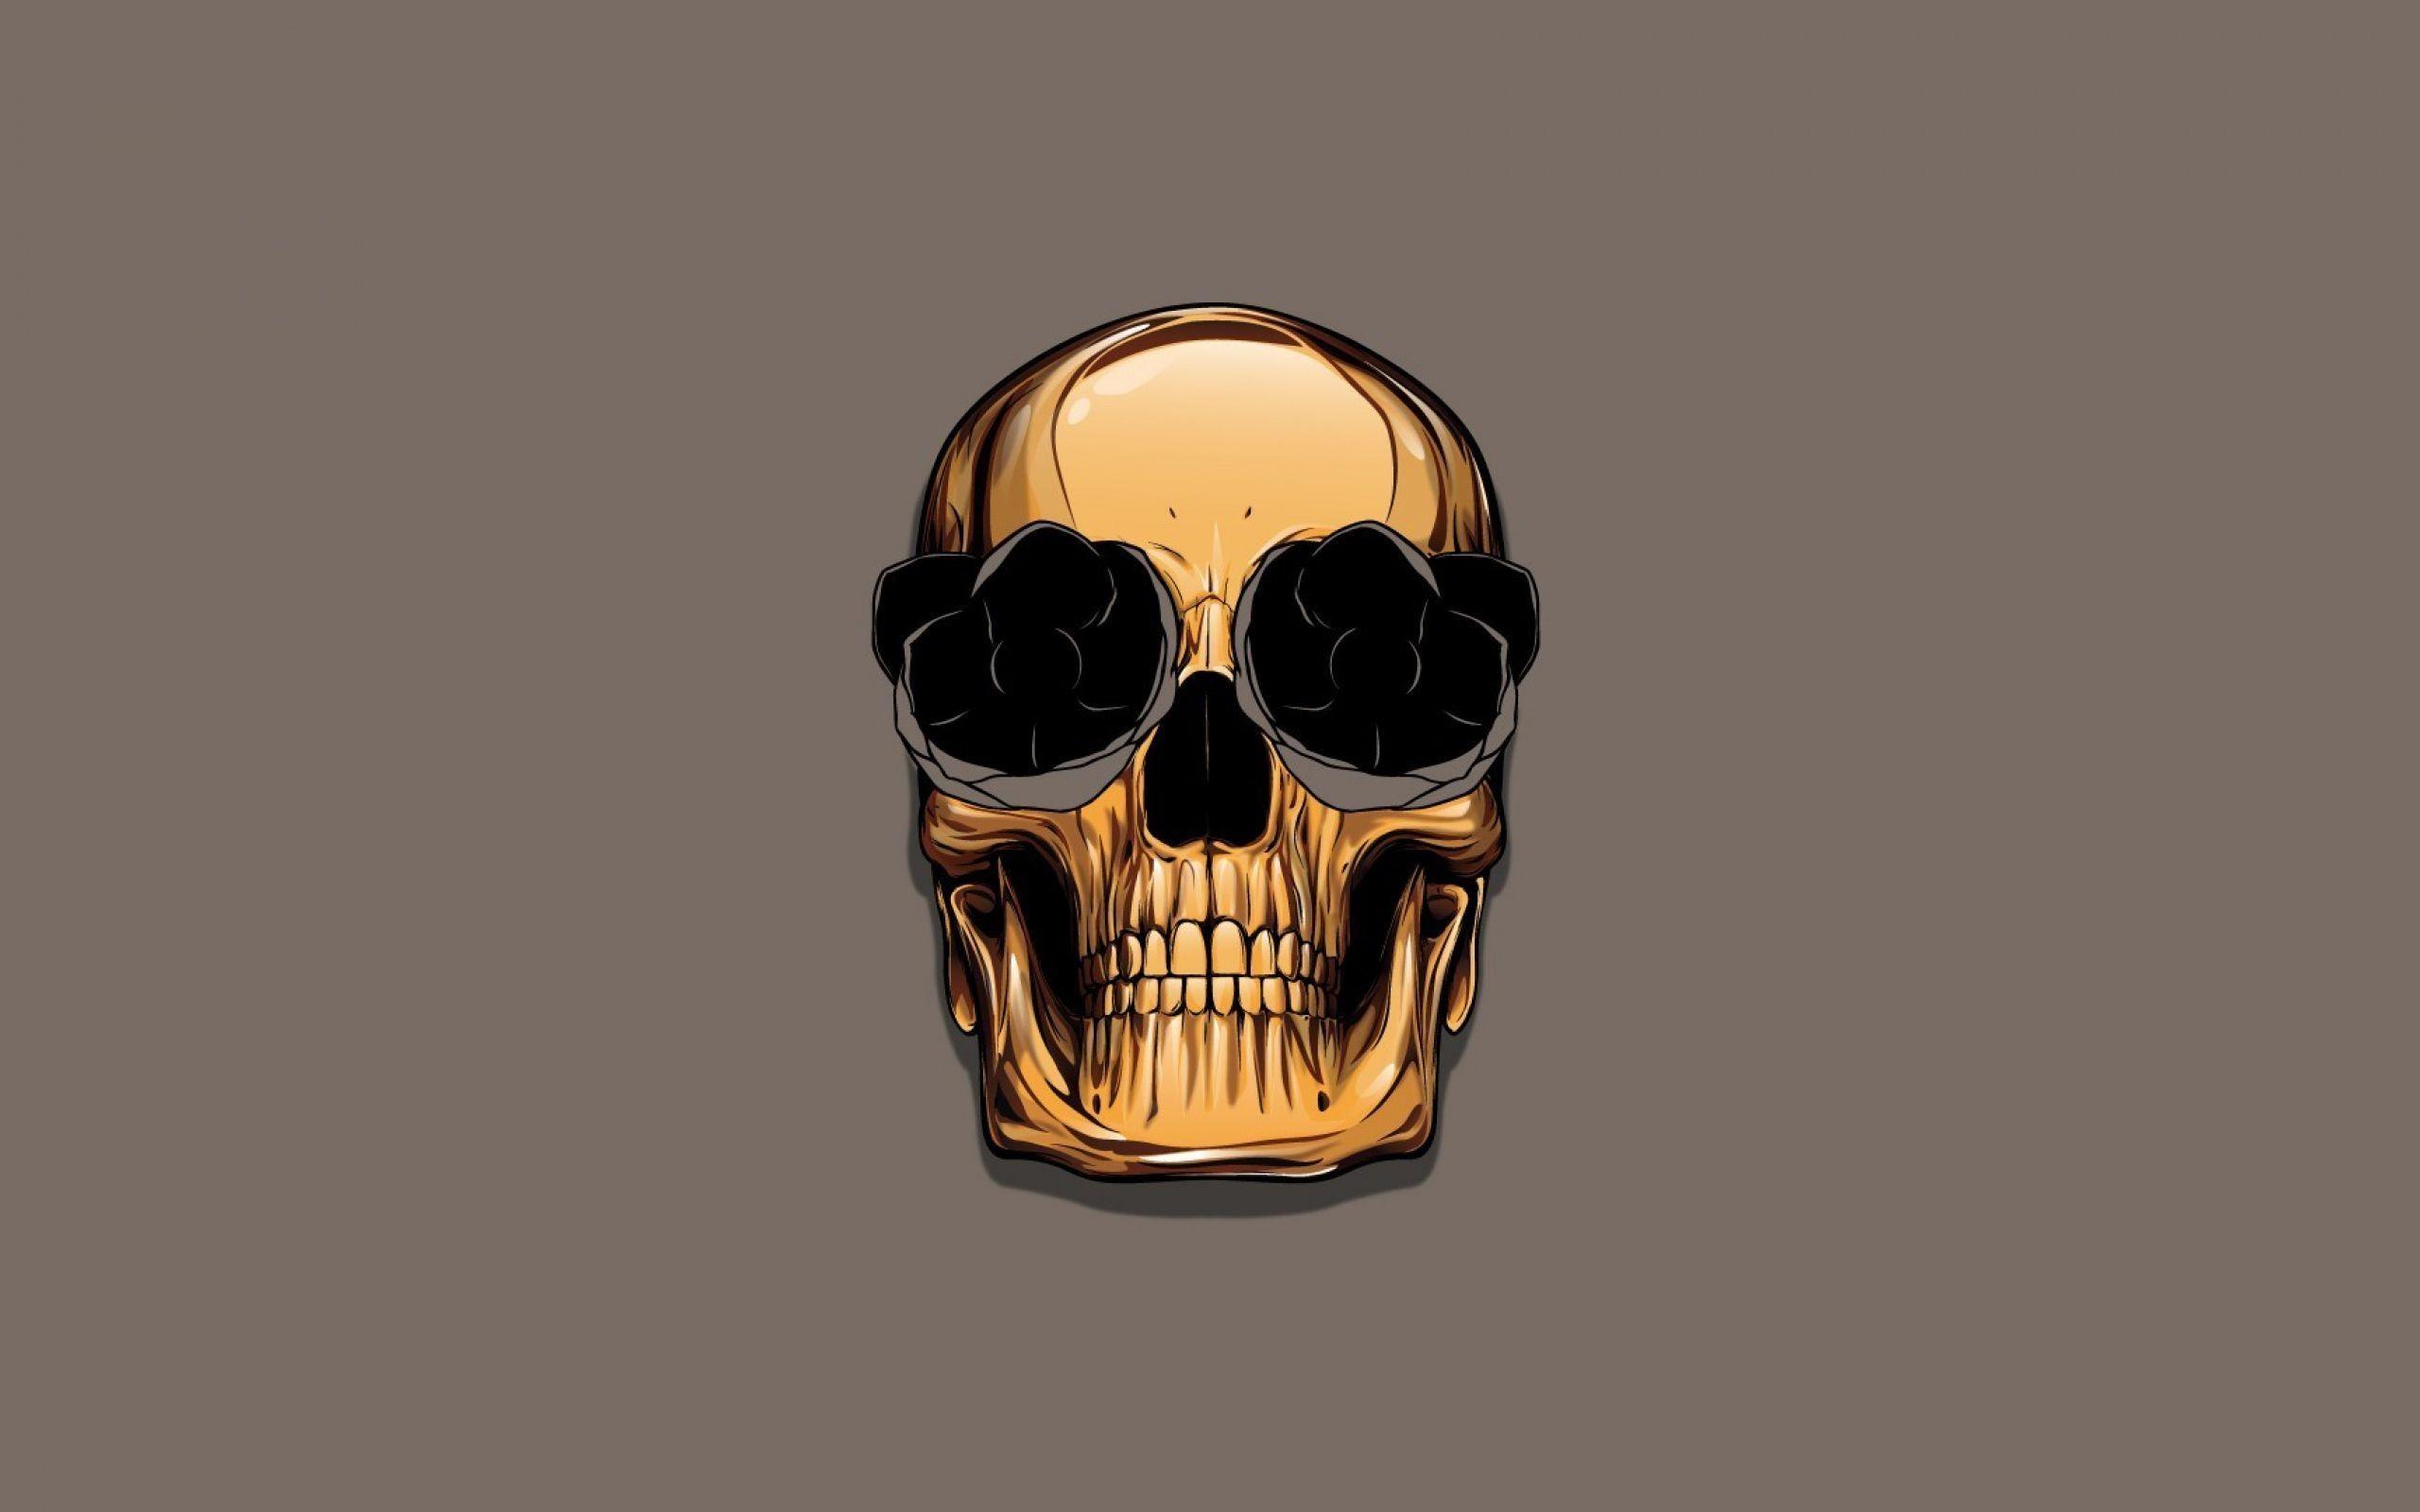 Skull Wallpapers HD, Desktop Backgrounds 2560×1600